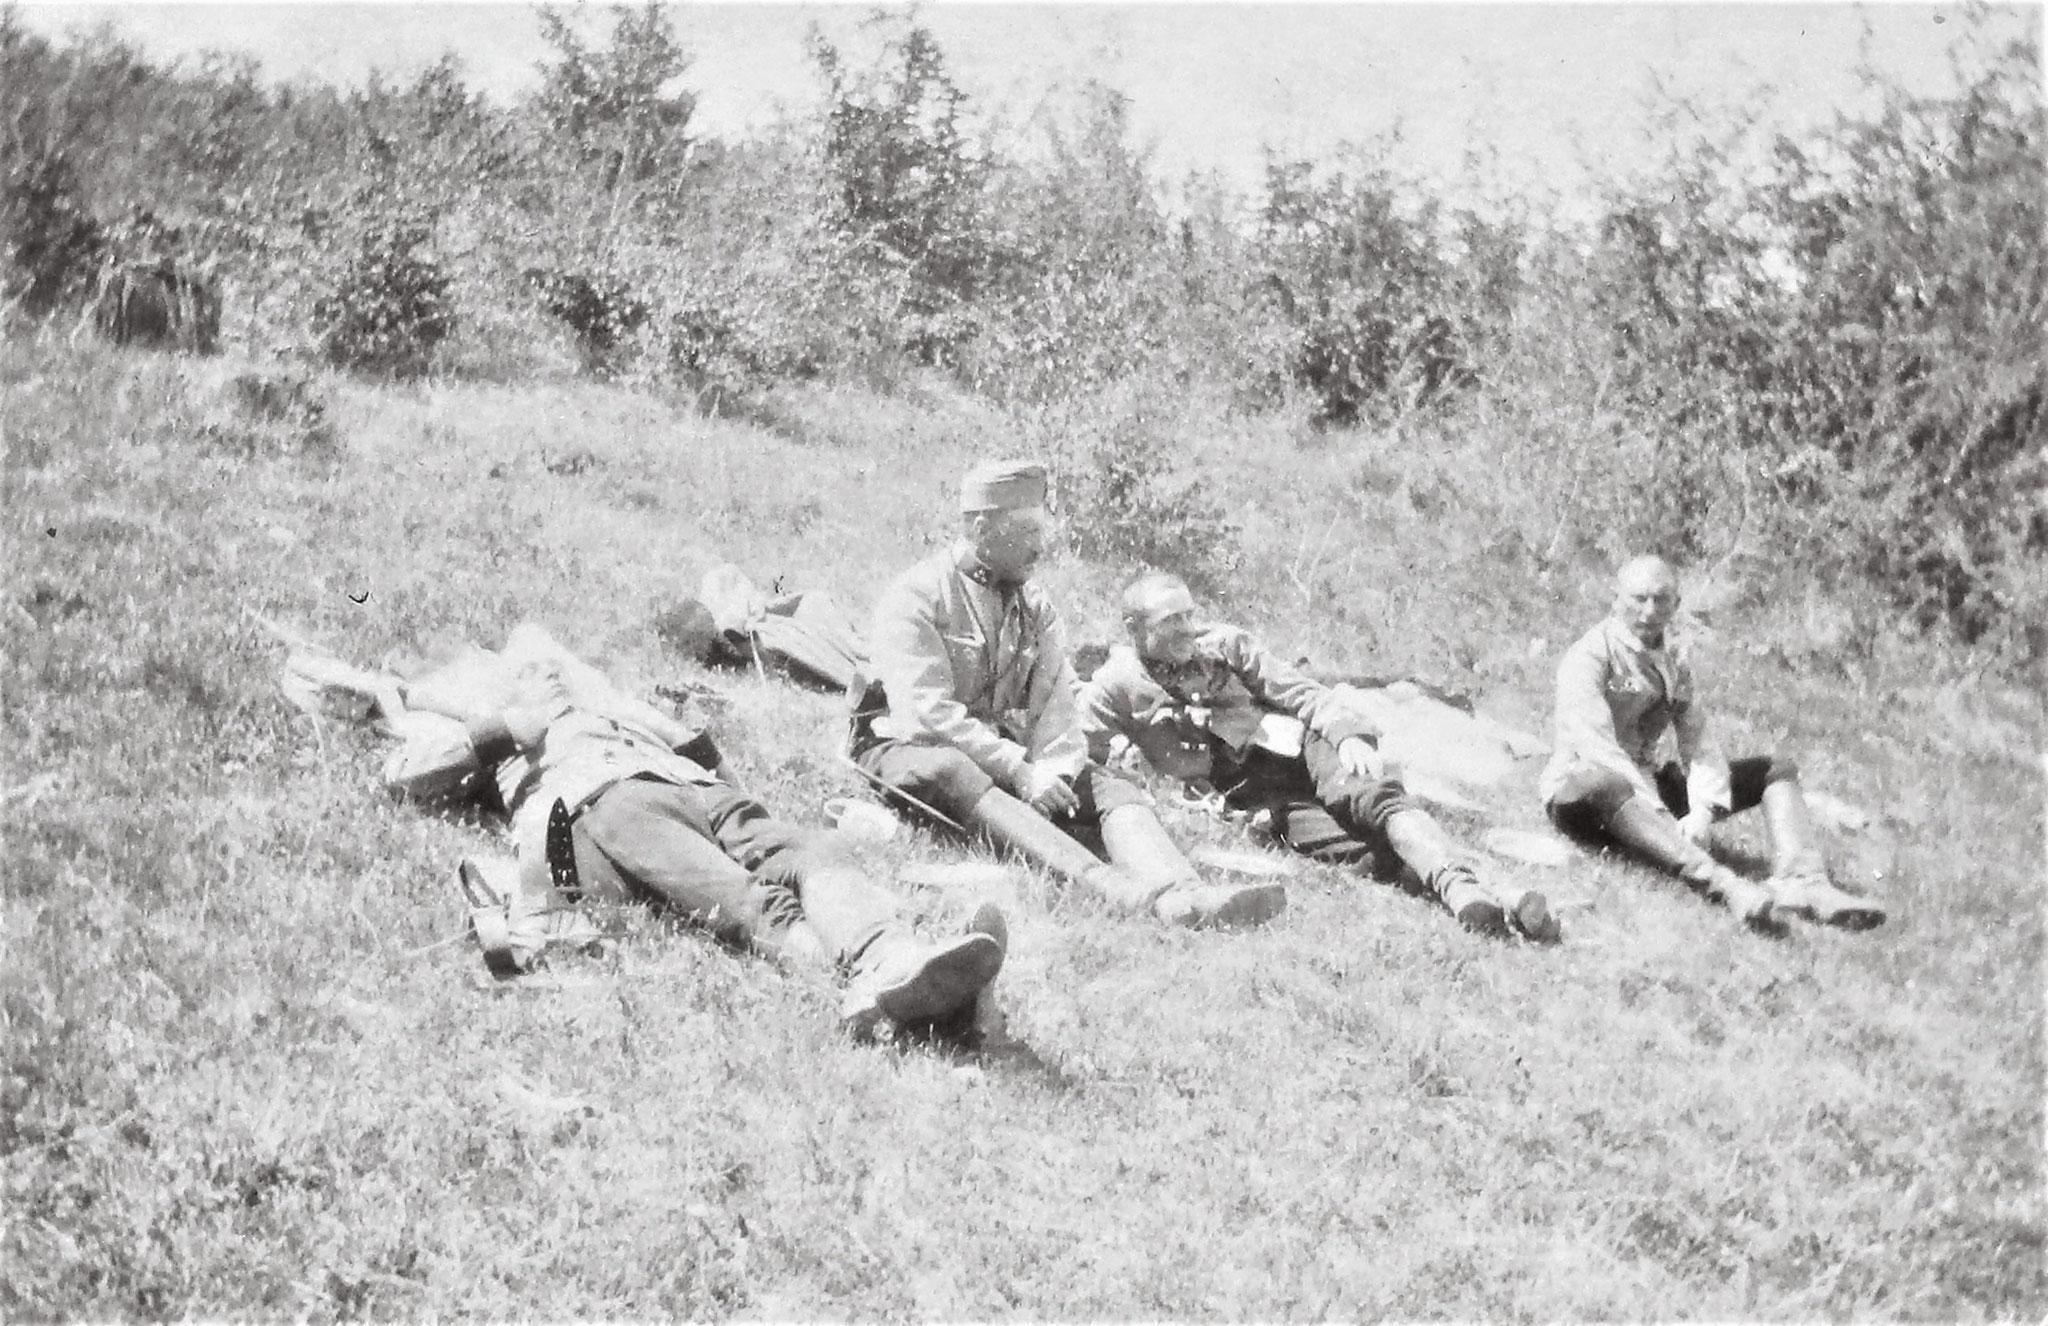 Lt Gerhard Cornides, Morawetz, Rtm Otto v. Gariboldi u. Lt Franz Penka (alle 1. Esk).